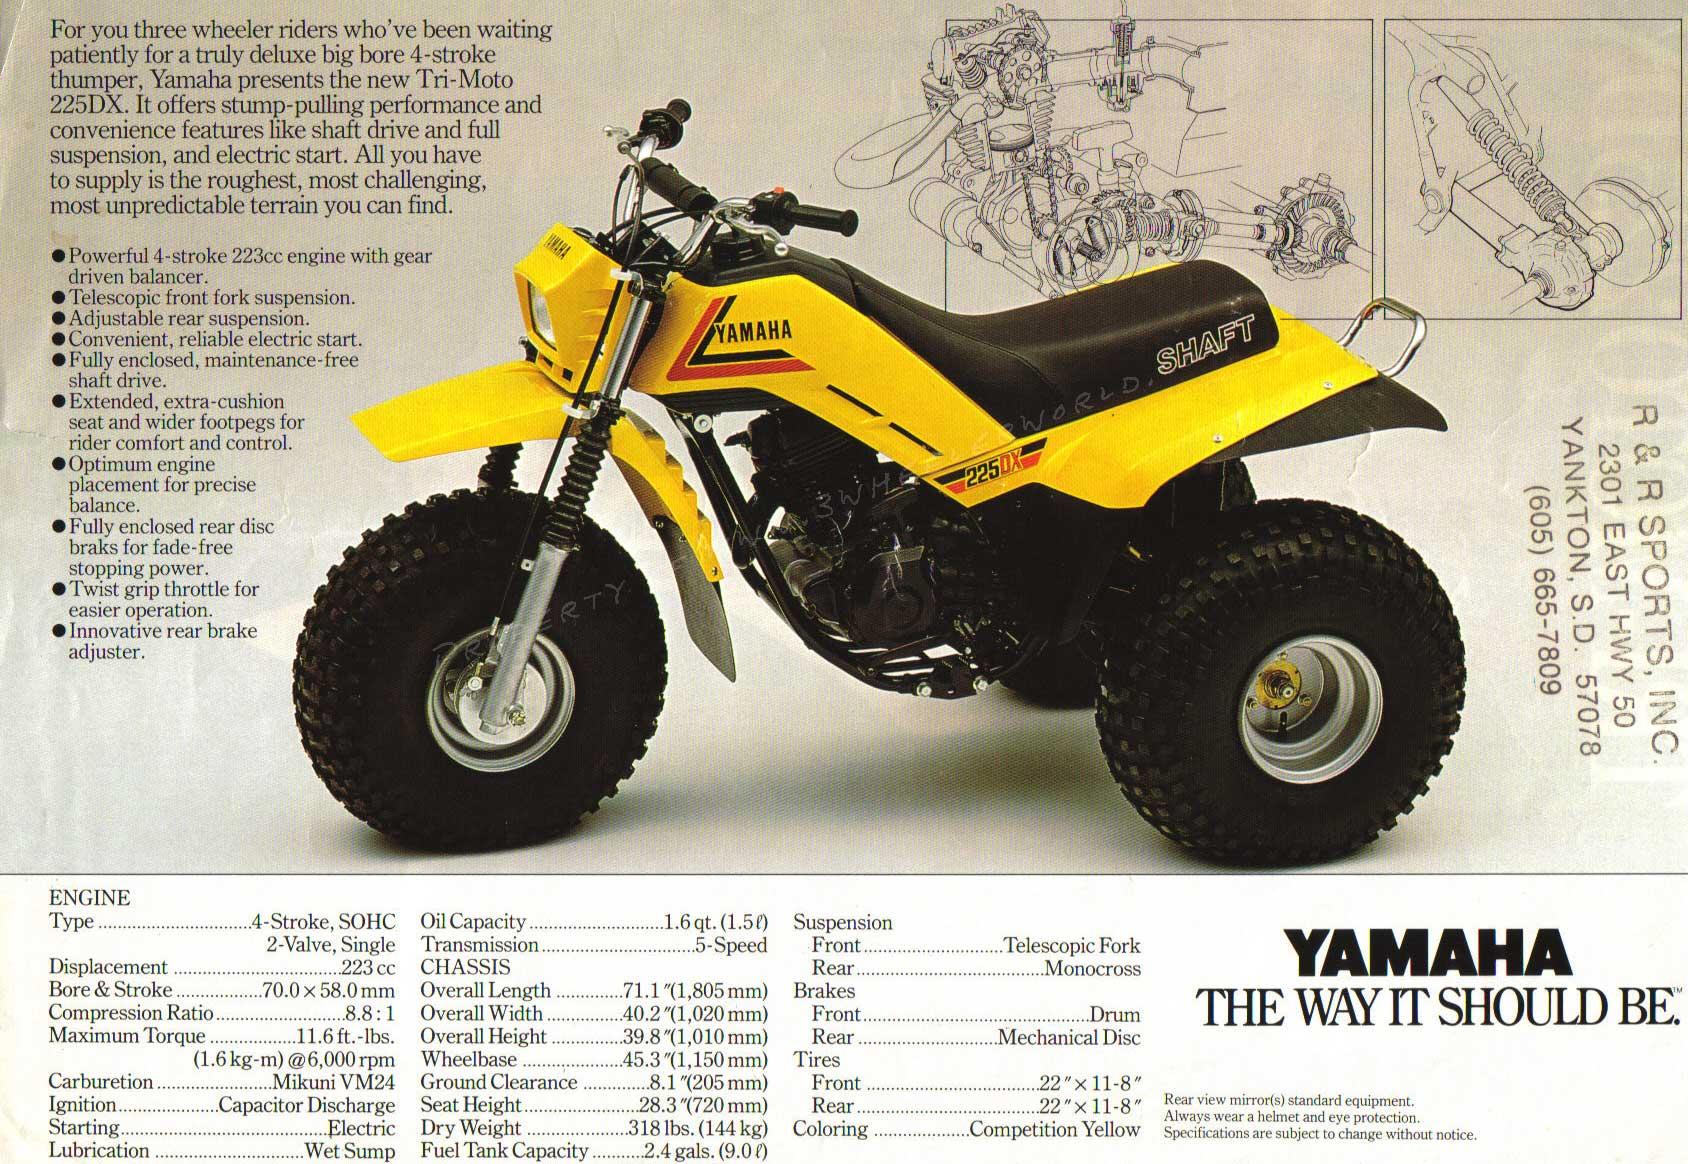 Yamaha 200e Three wheeler Manual